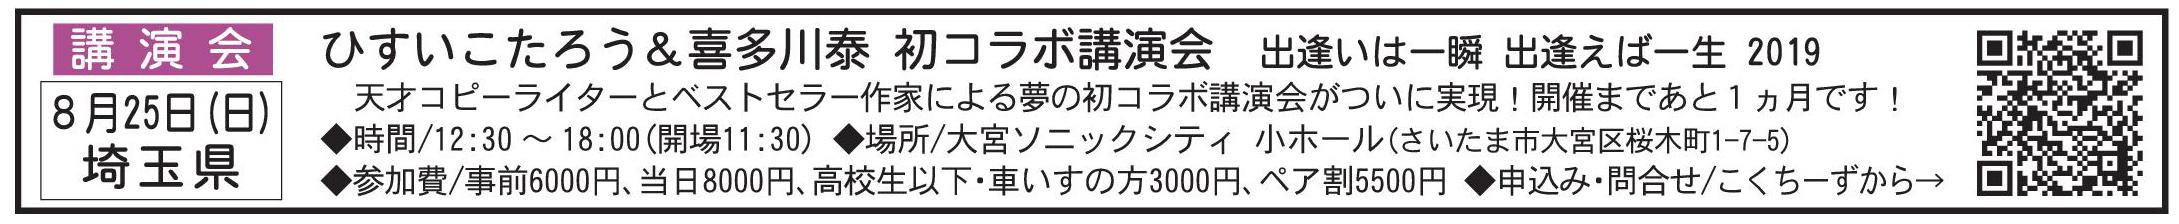 2800muryou2.jpg